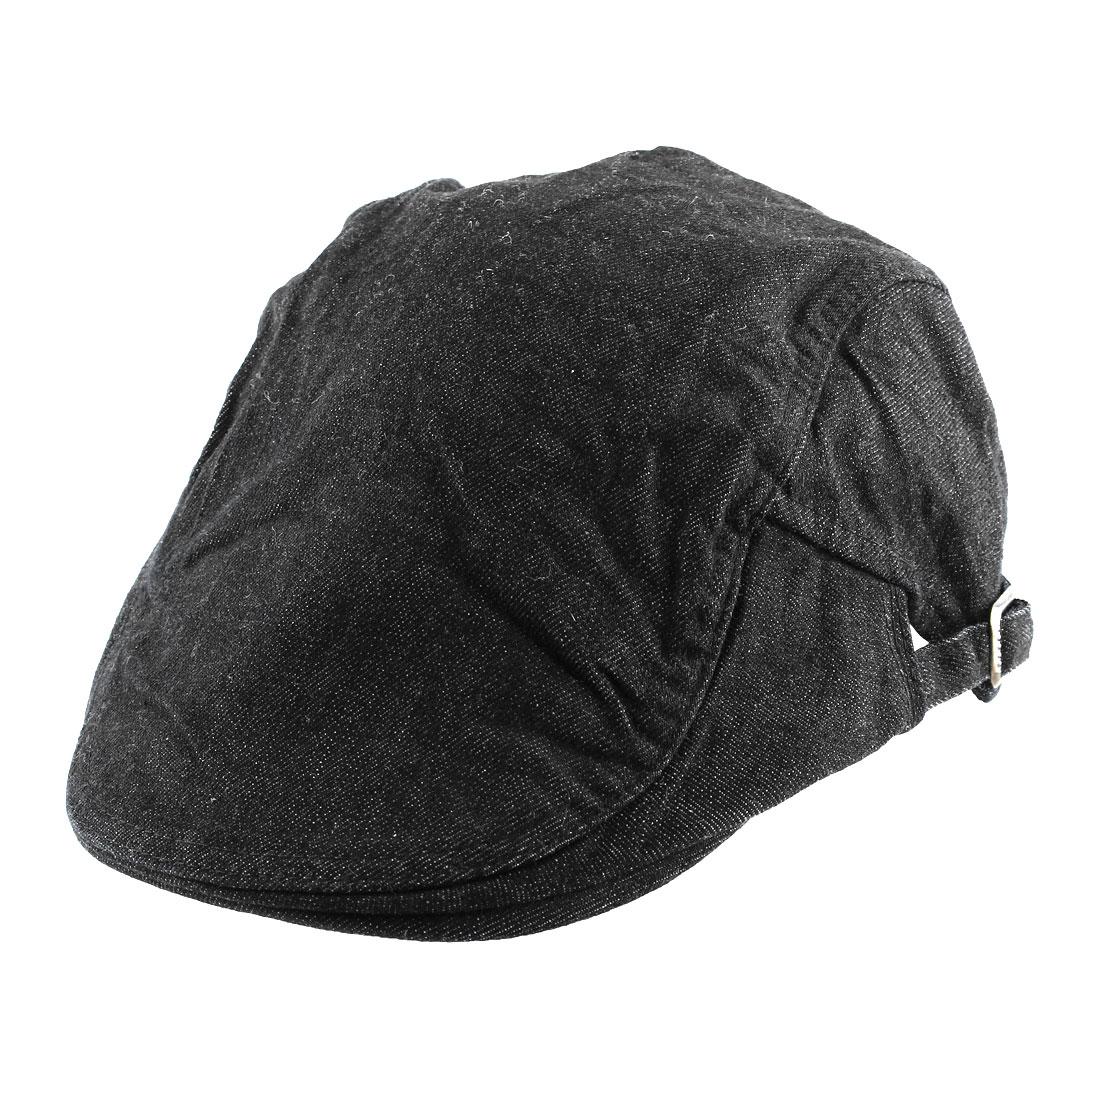 Men Women Vintage Style Newsboy Canvas Ivy Cap Driving Casual Beret Hat Black